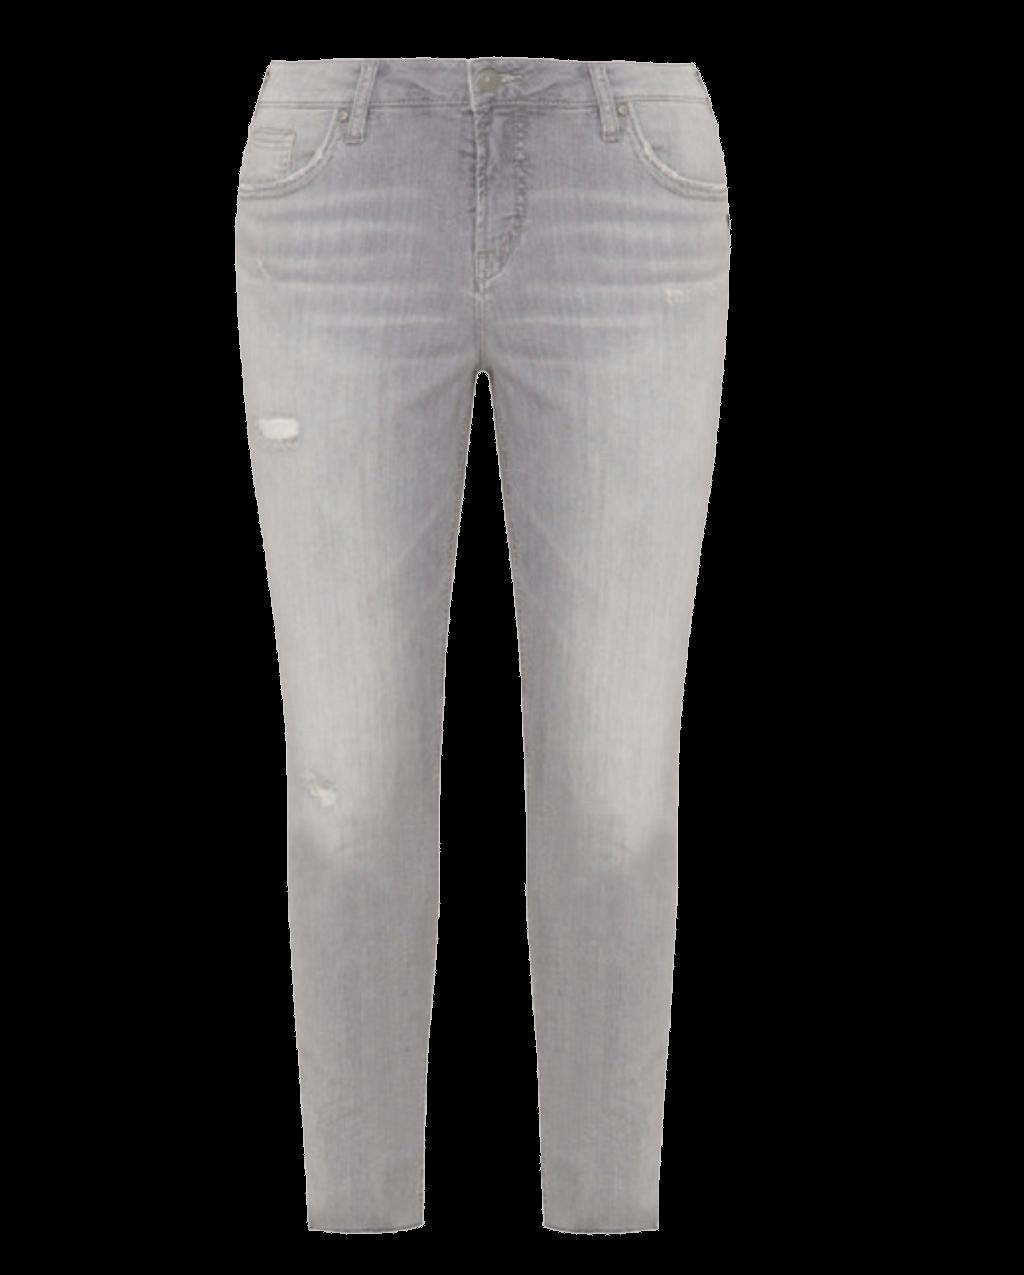 Clipart pants pants pocket. Jeans freetoedit sticker by